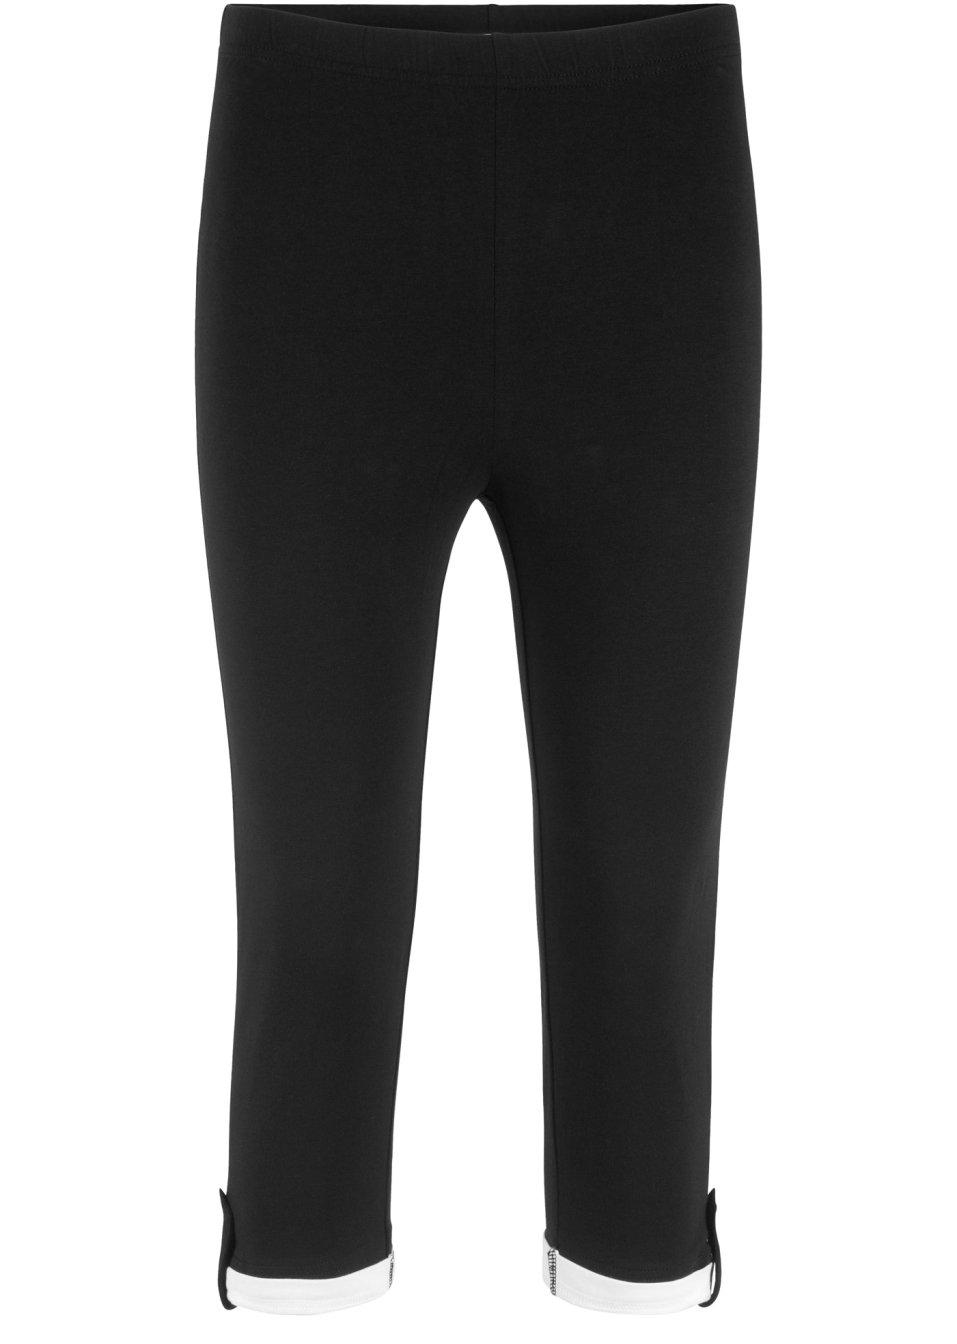 Bequeme Basic-Capri-Leggings - schwarz TTqST Ocsxm